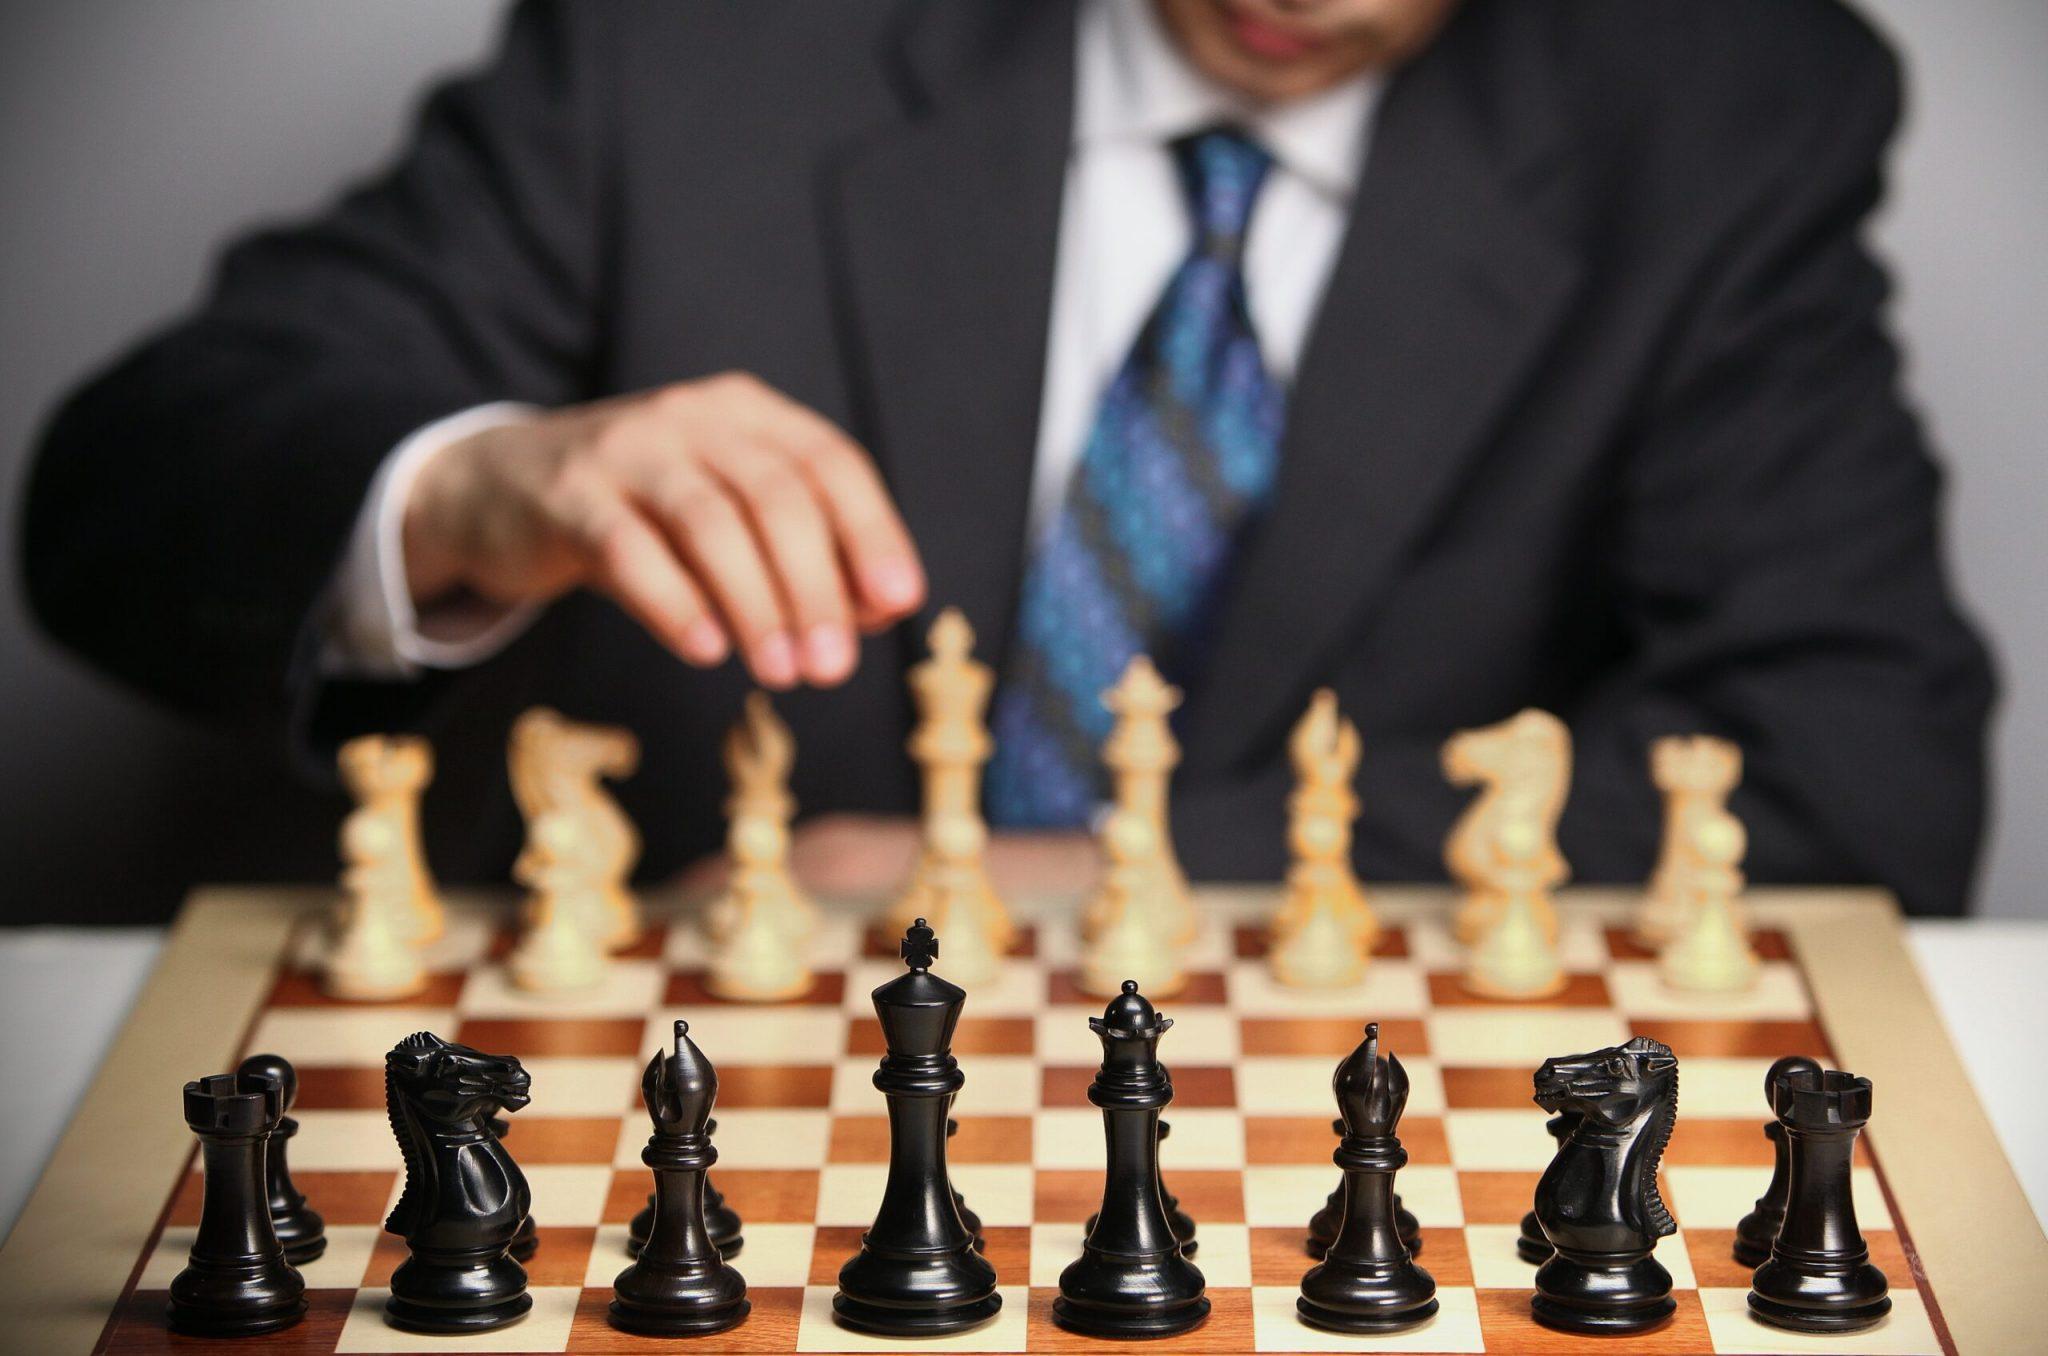 shallow focus photo of chess set